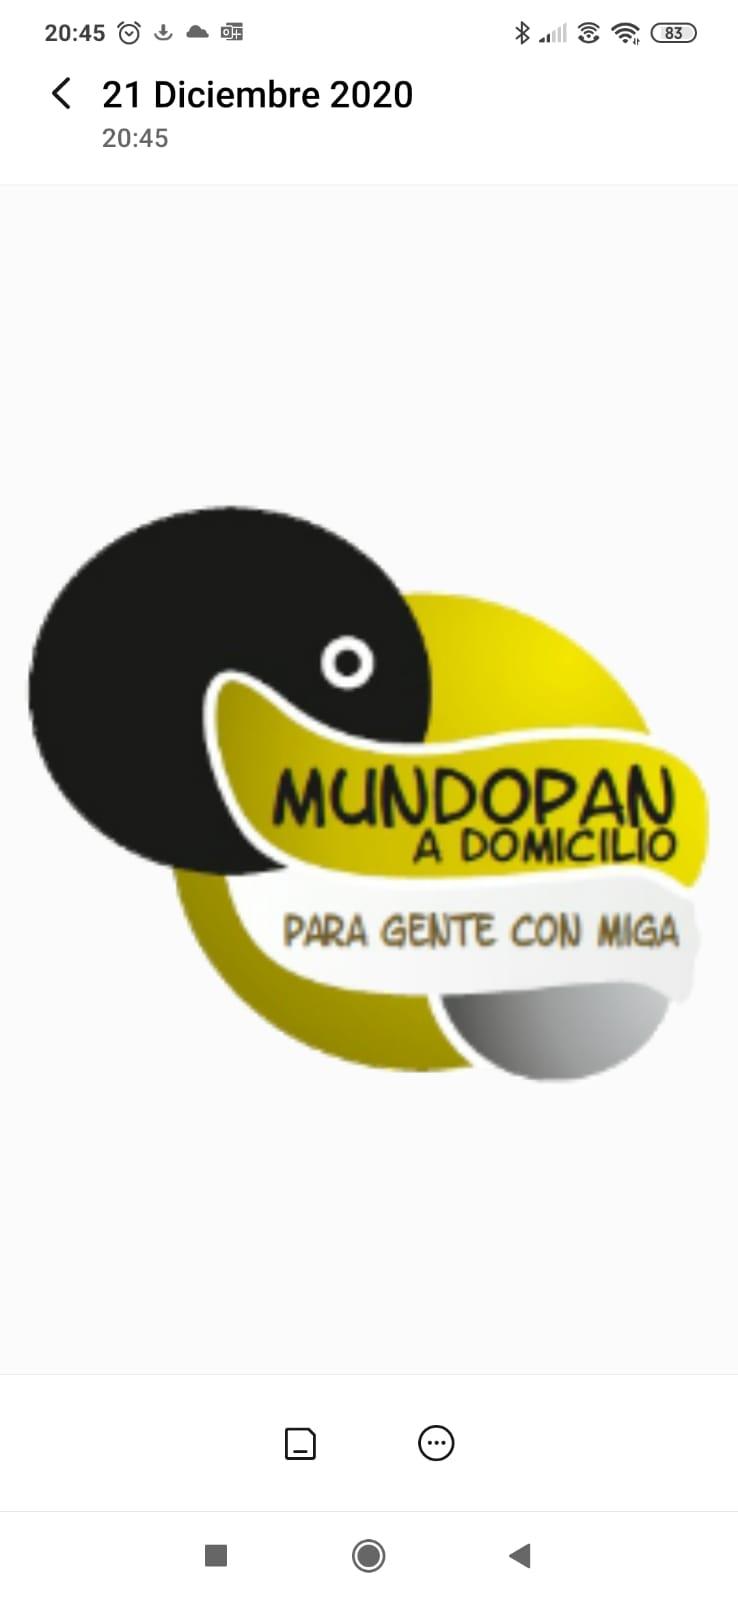 Mundopan Tenerife Centro